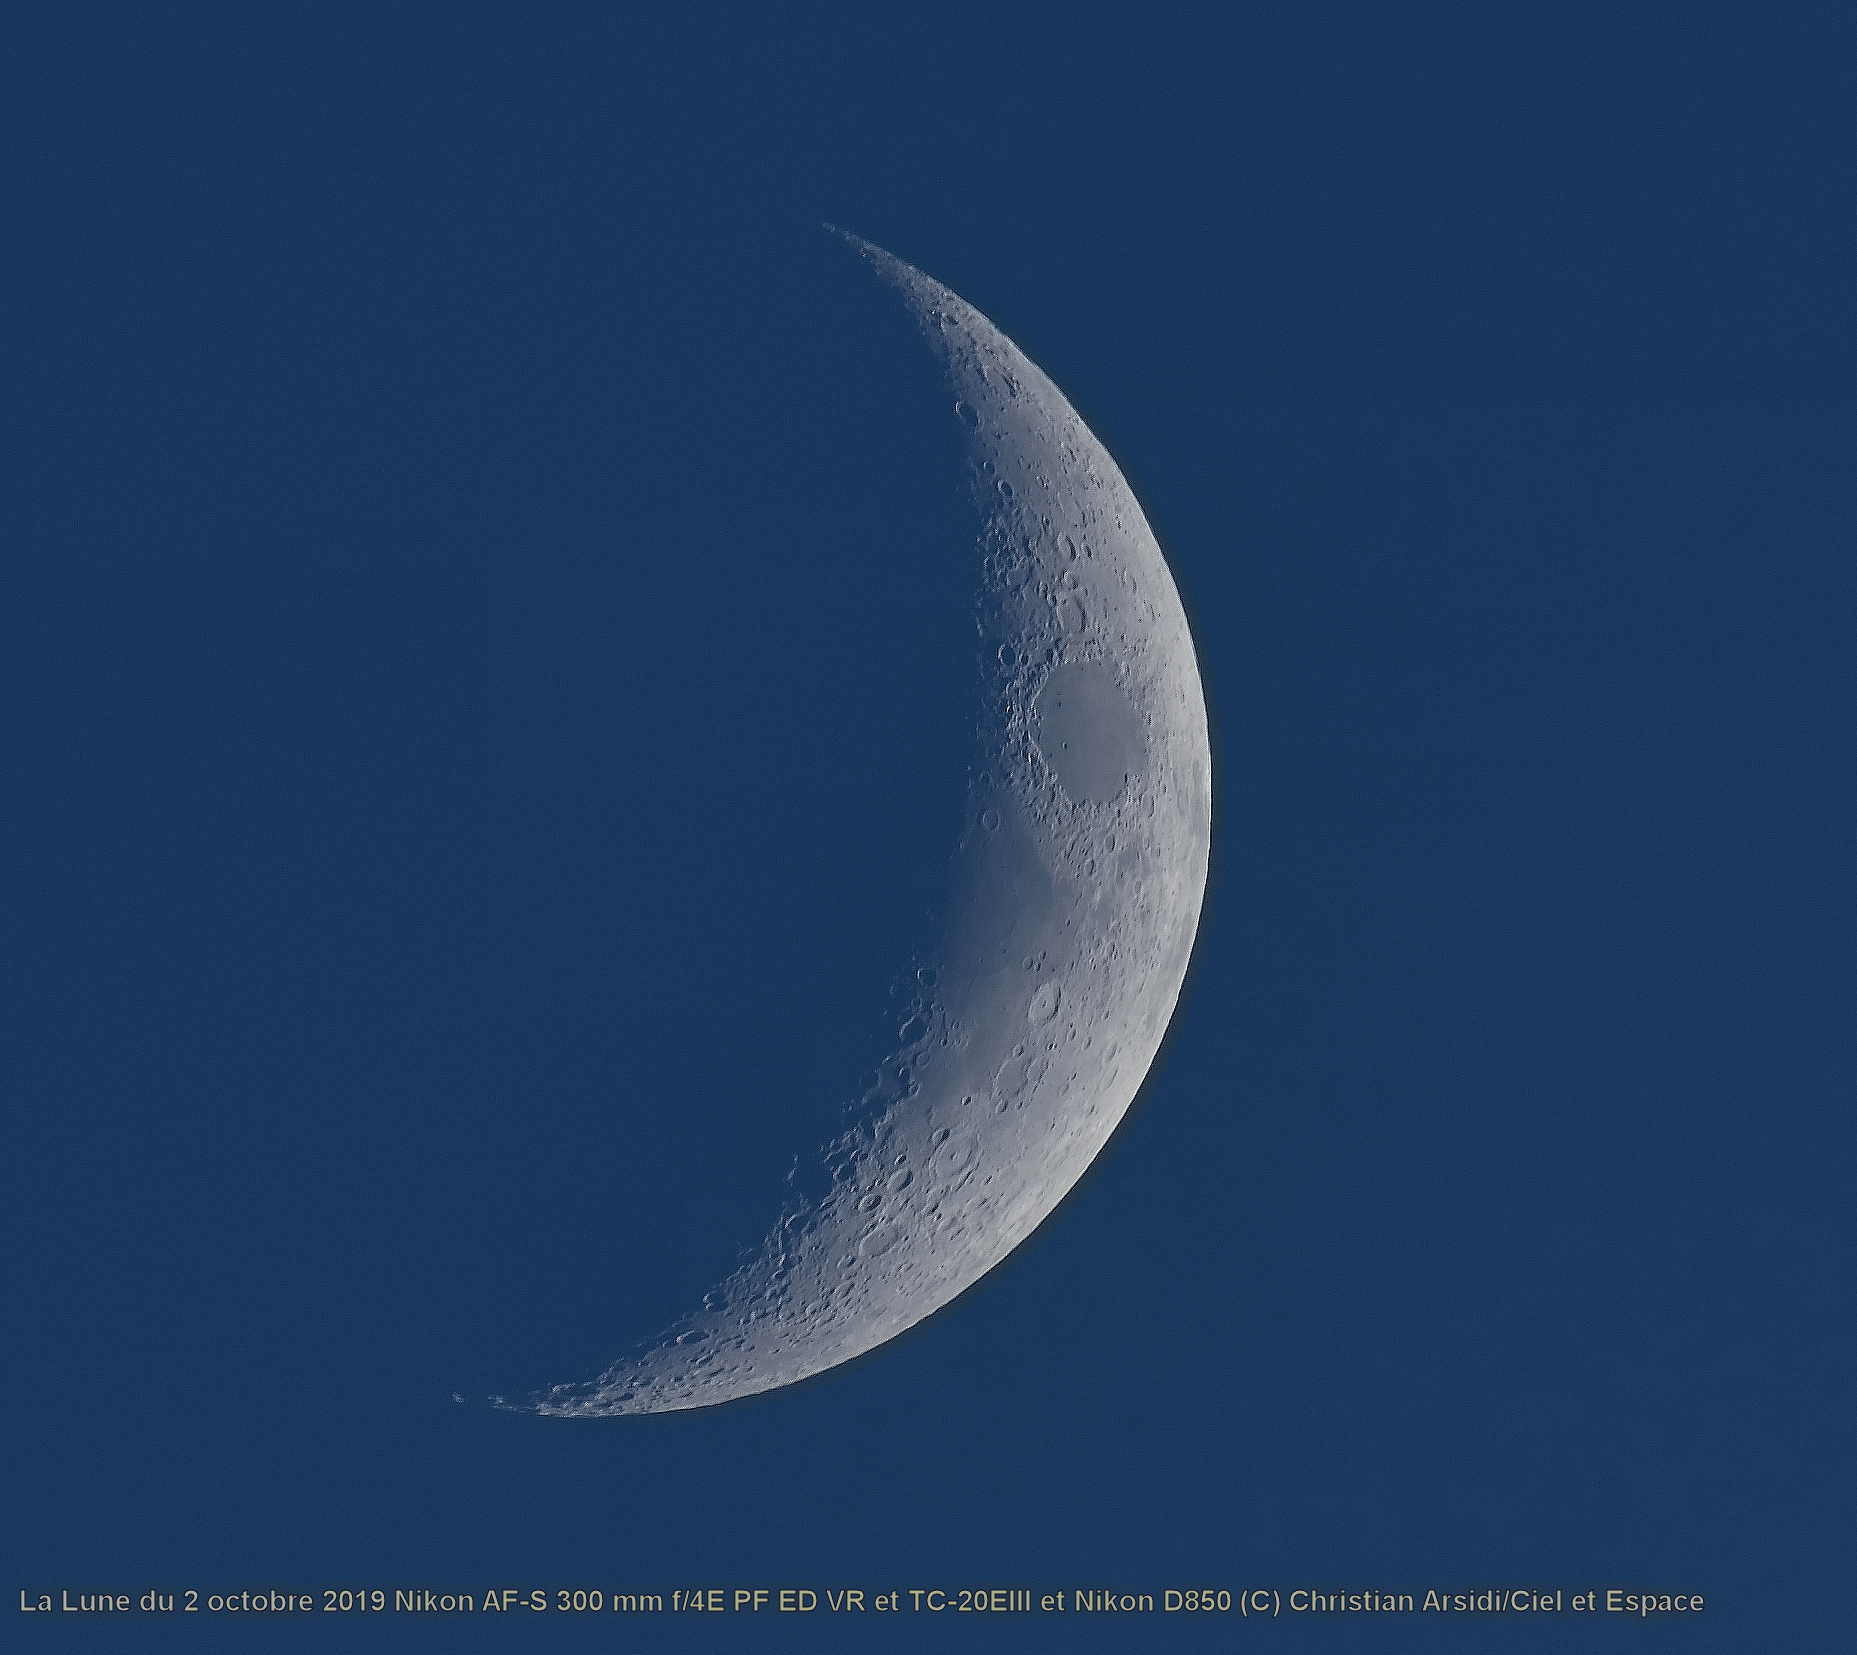 La Lune 25 images BV CA 100% BV2 Jpeg.jpg